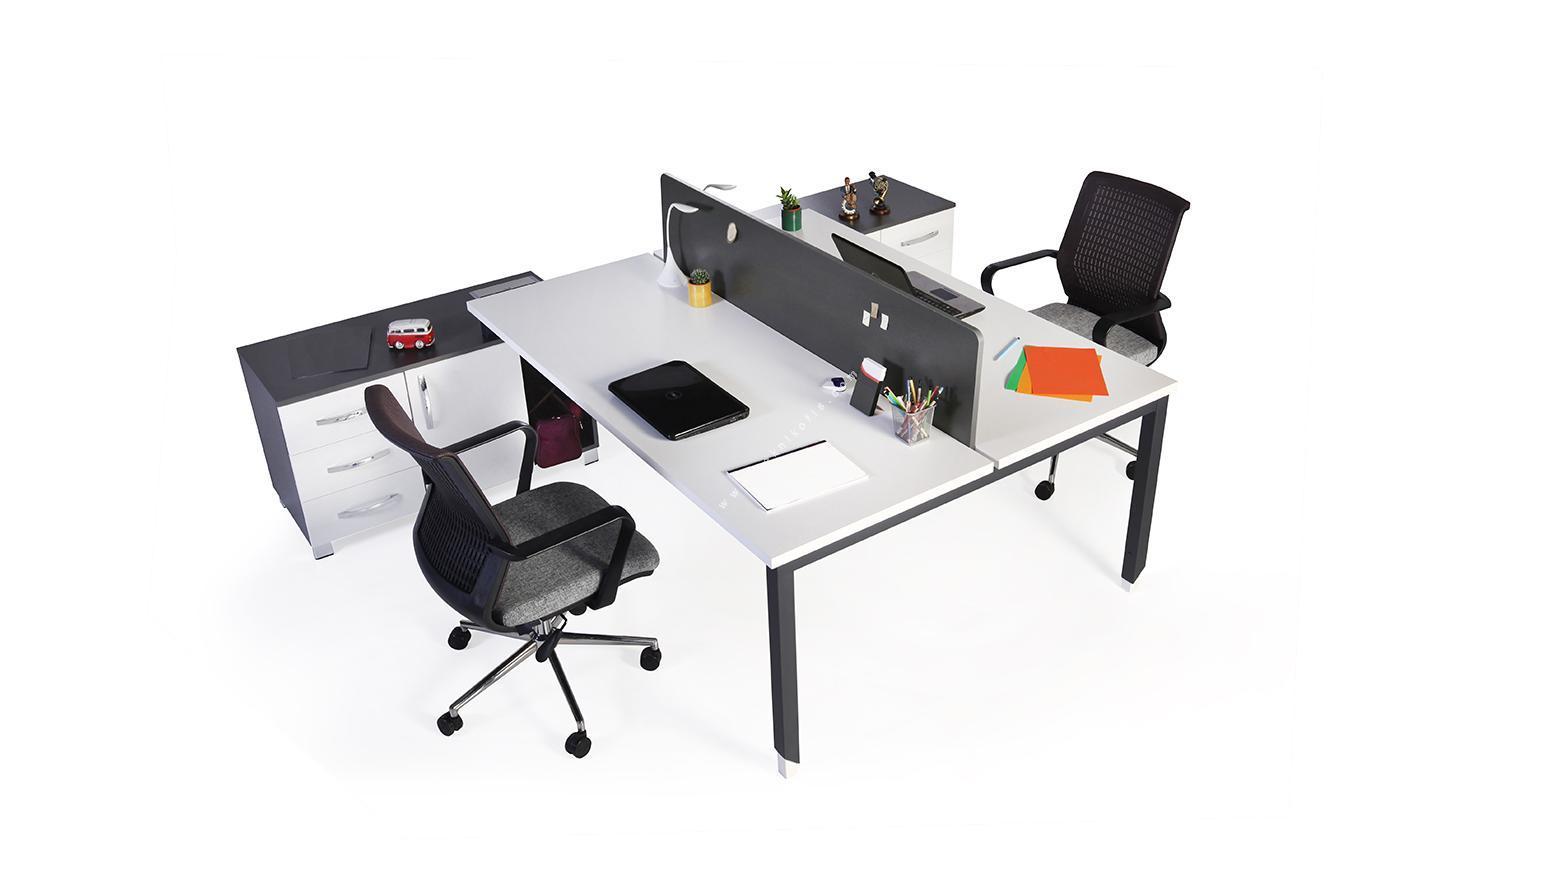 toung etajerli melamin seperatörlü ikili workstation 180cm